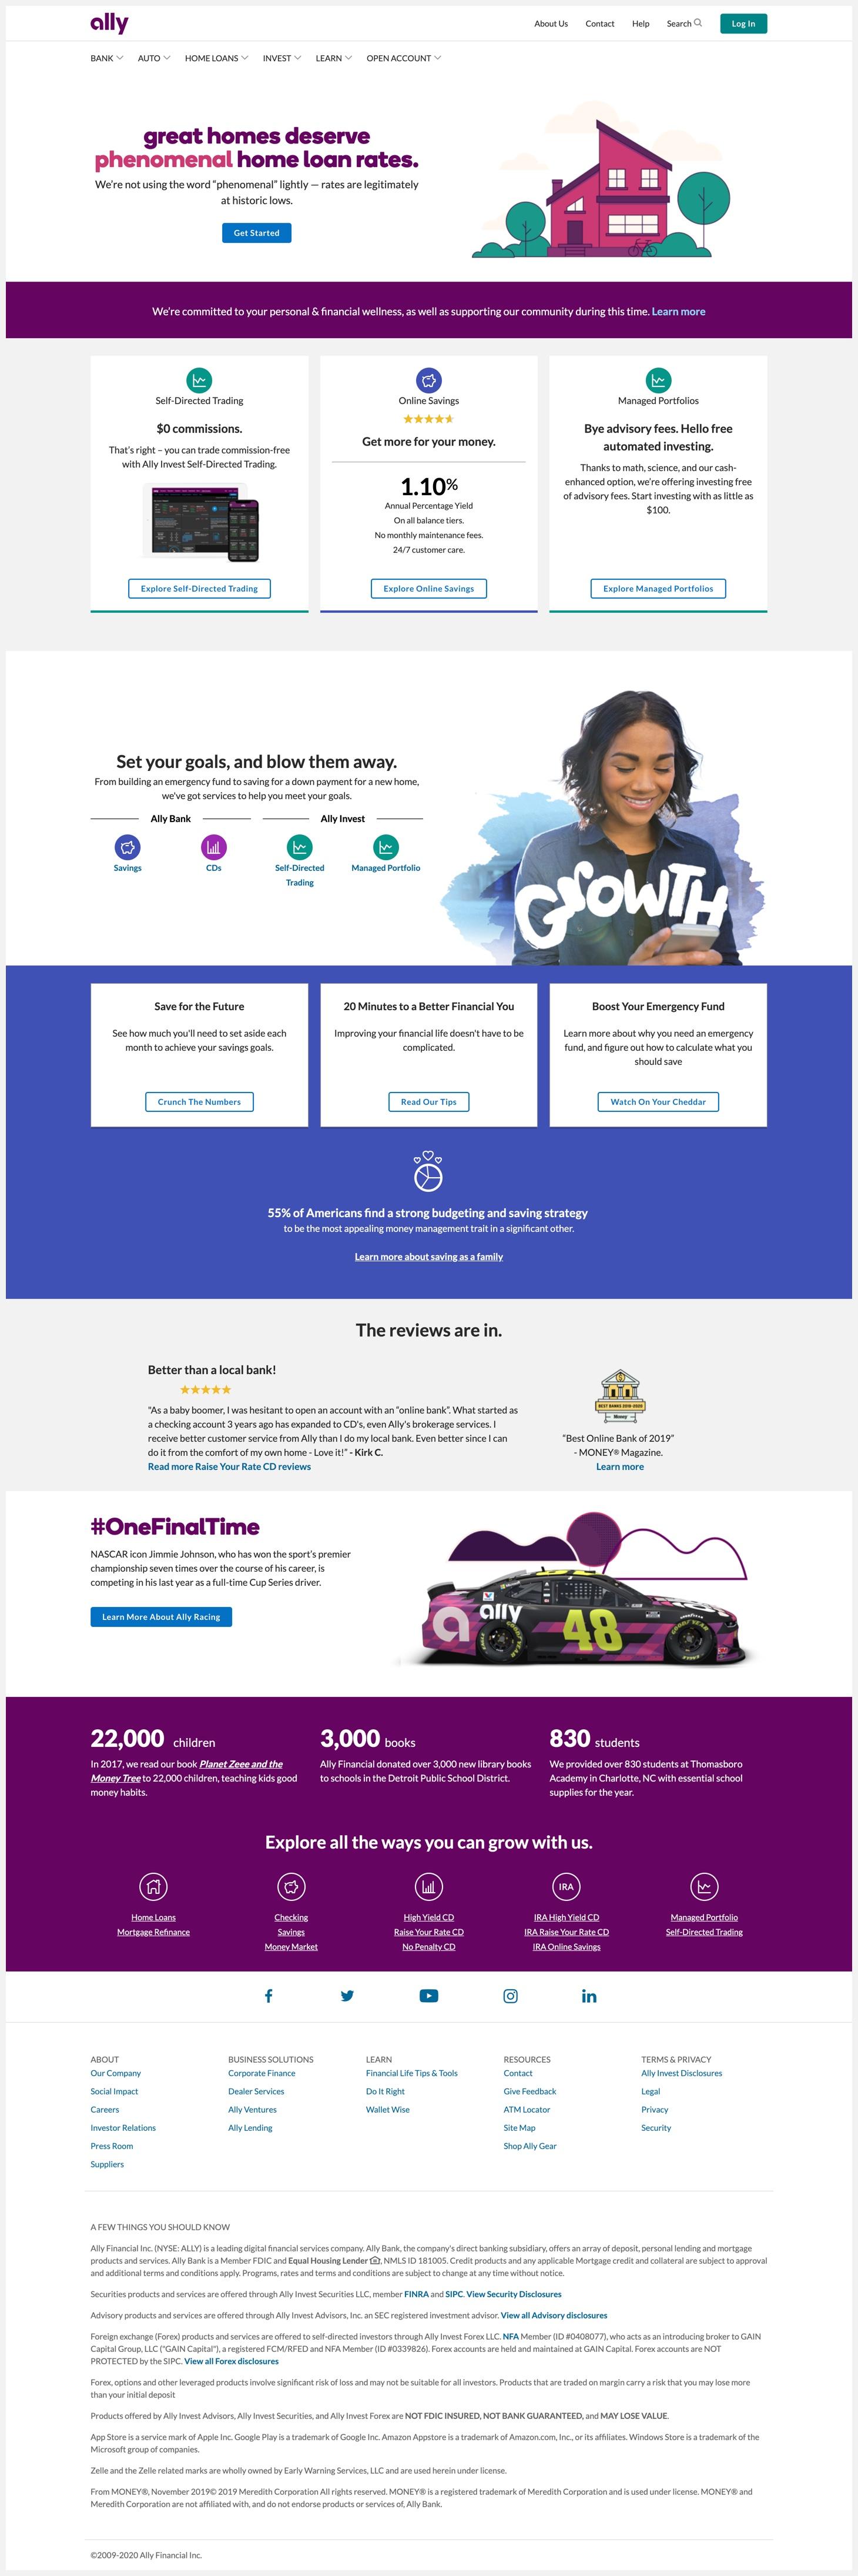 Ally Financial's website.